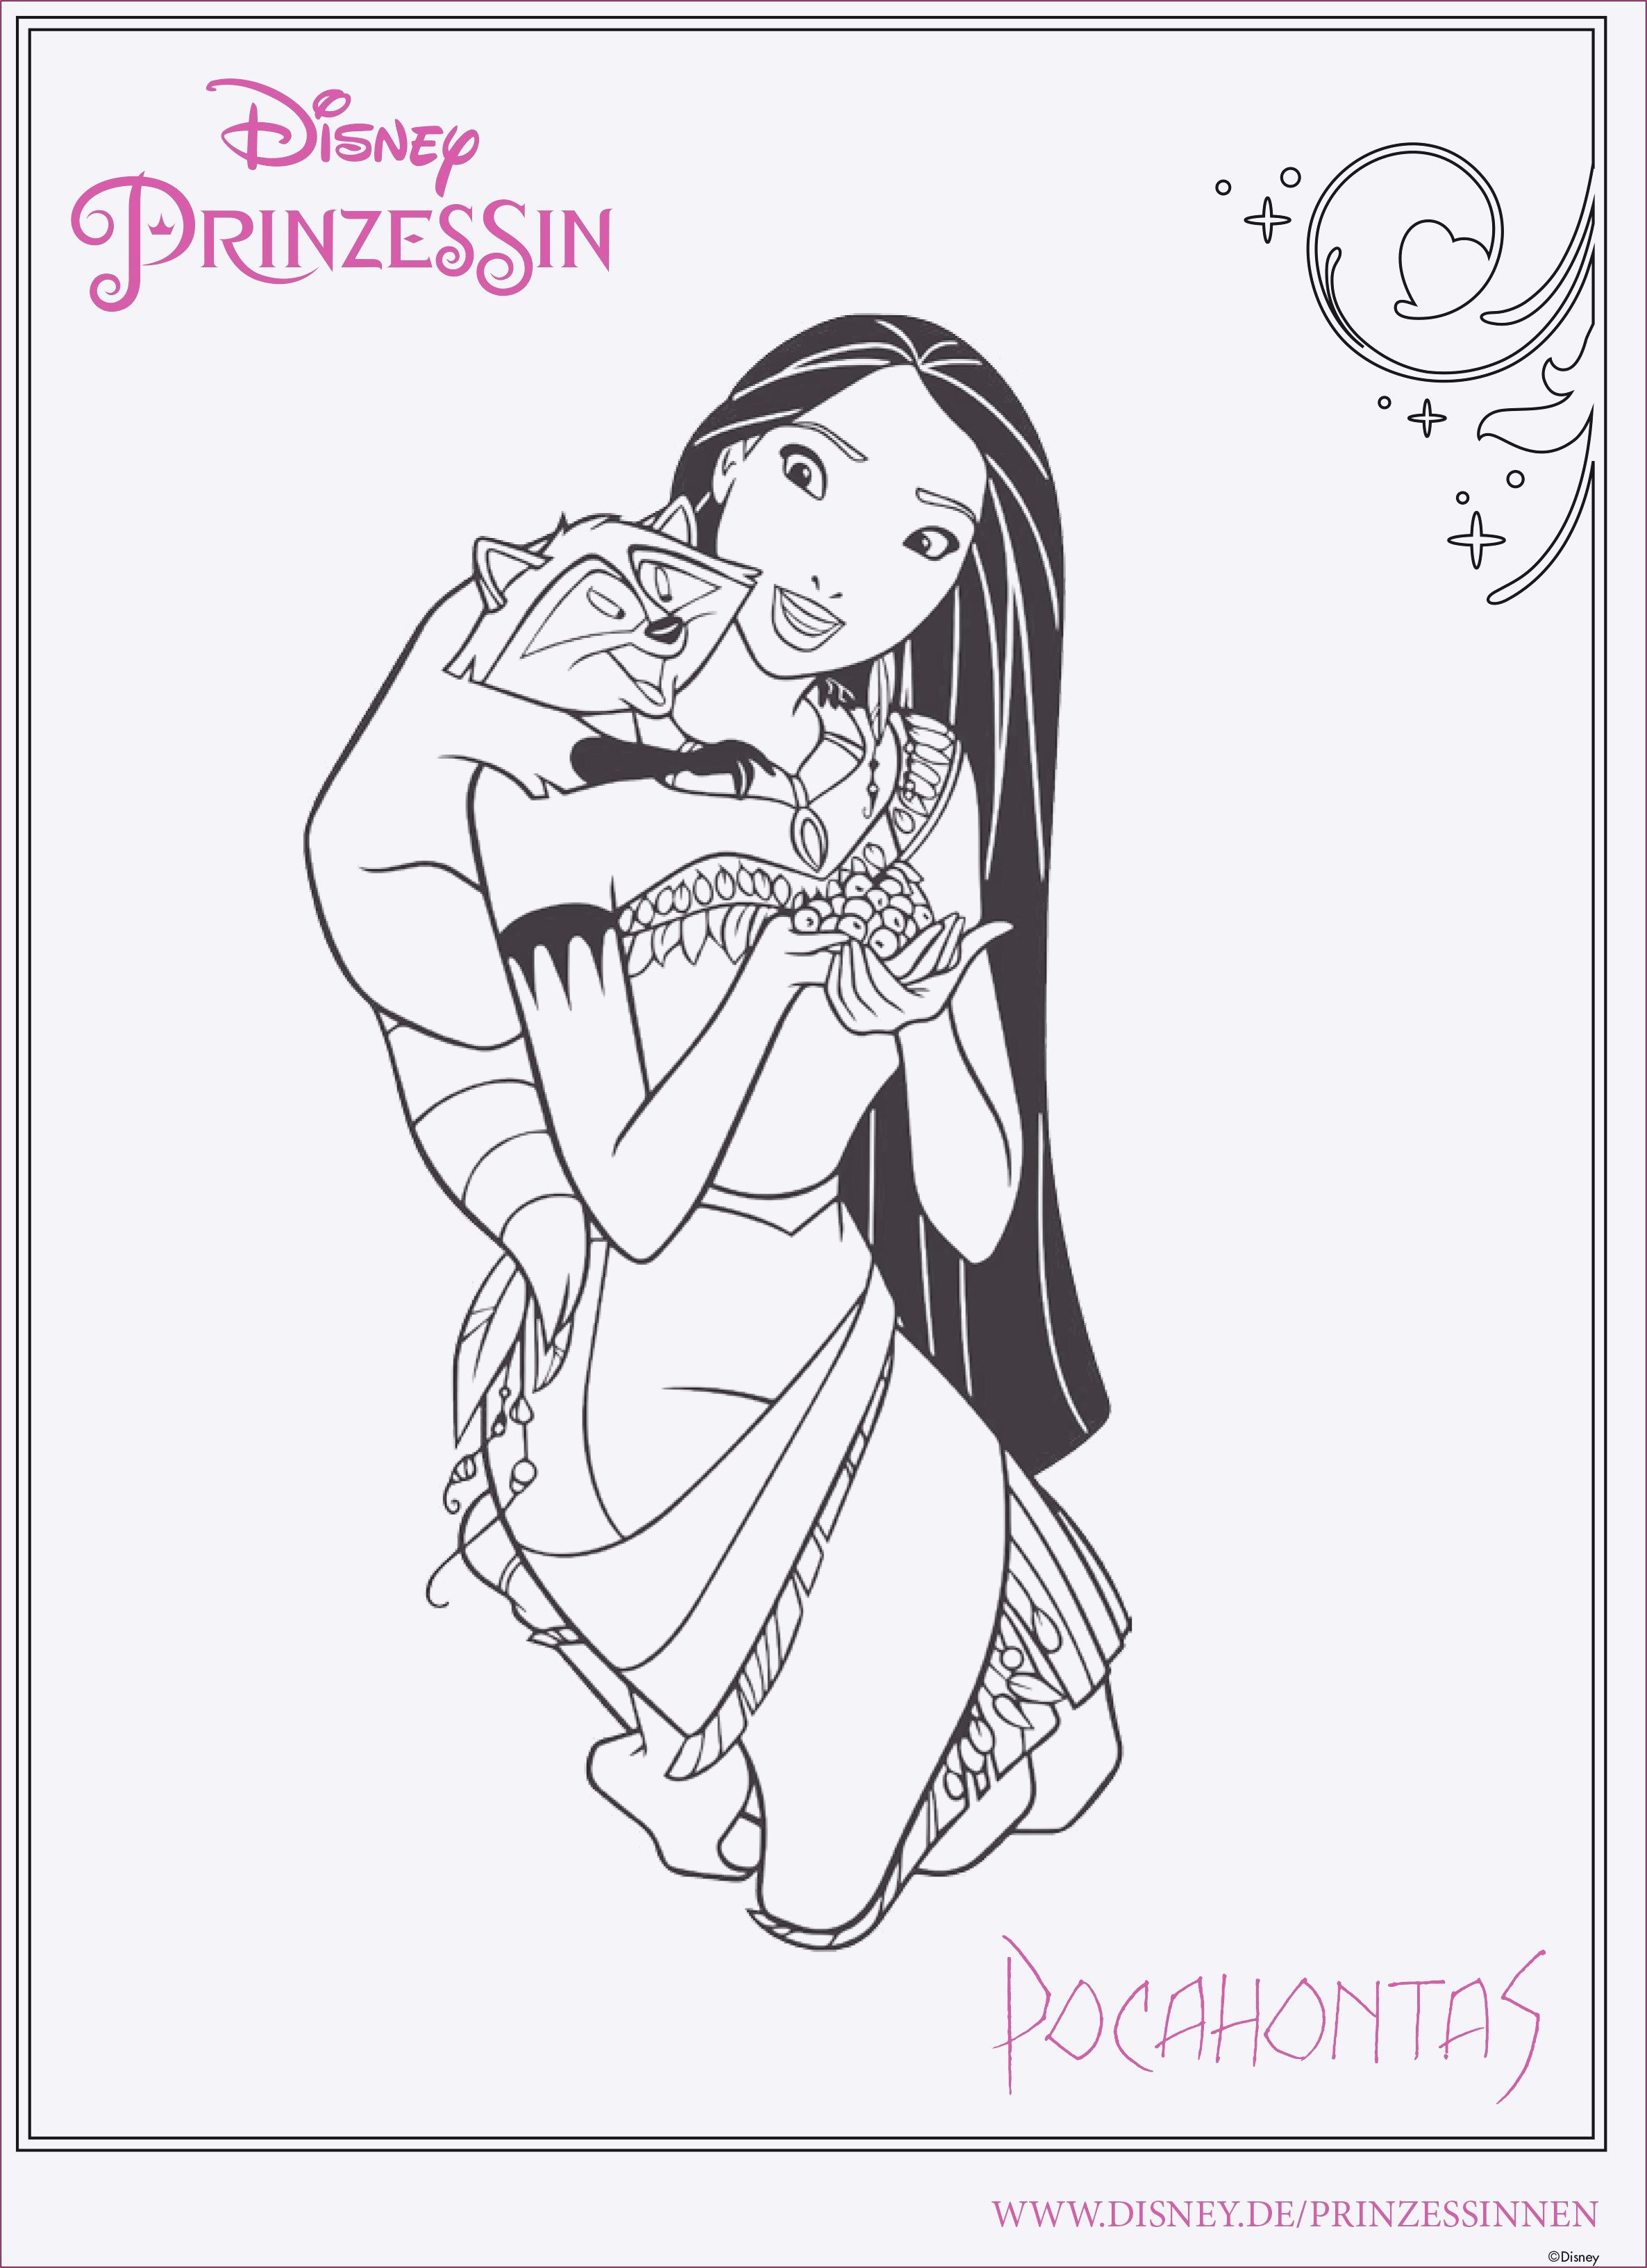 Ausmalbilder Disney Fairies Genial 96 Neu Disney Princess Ausmalbilder Das Bild Bilder